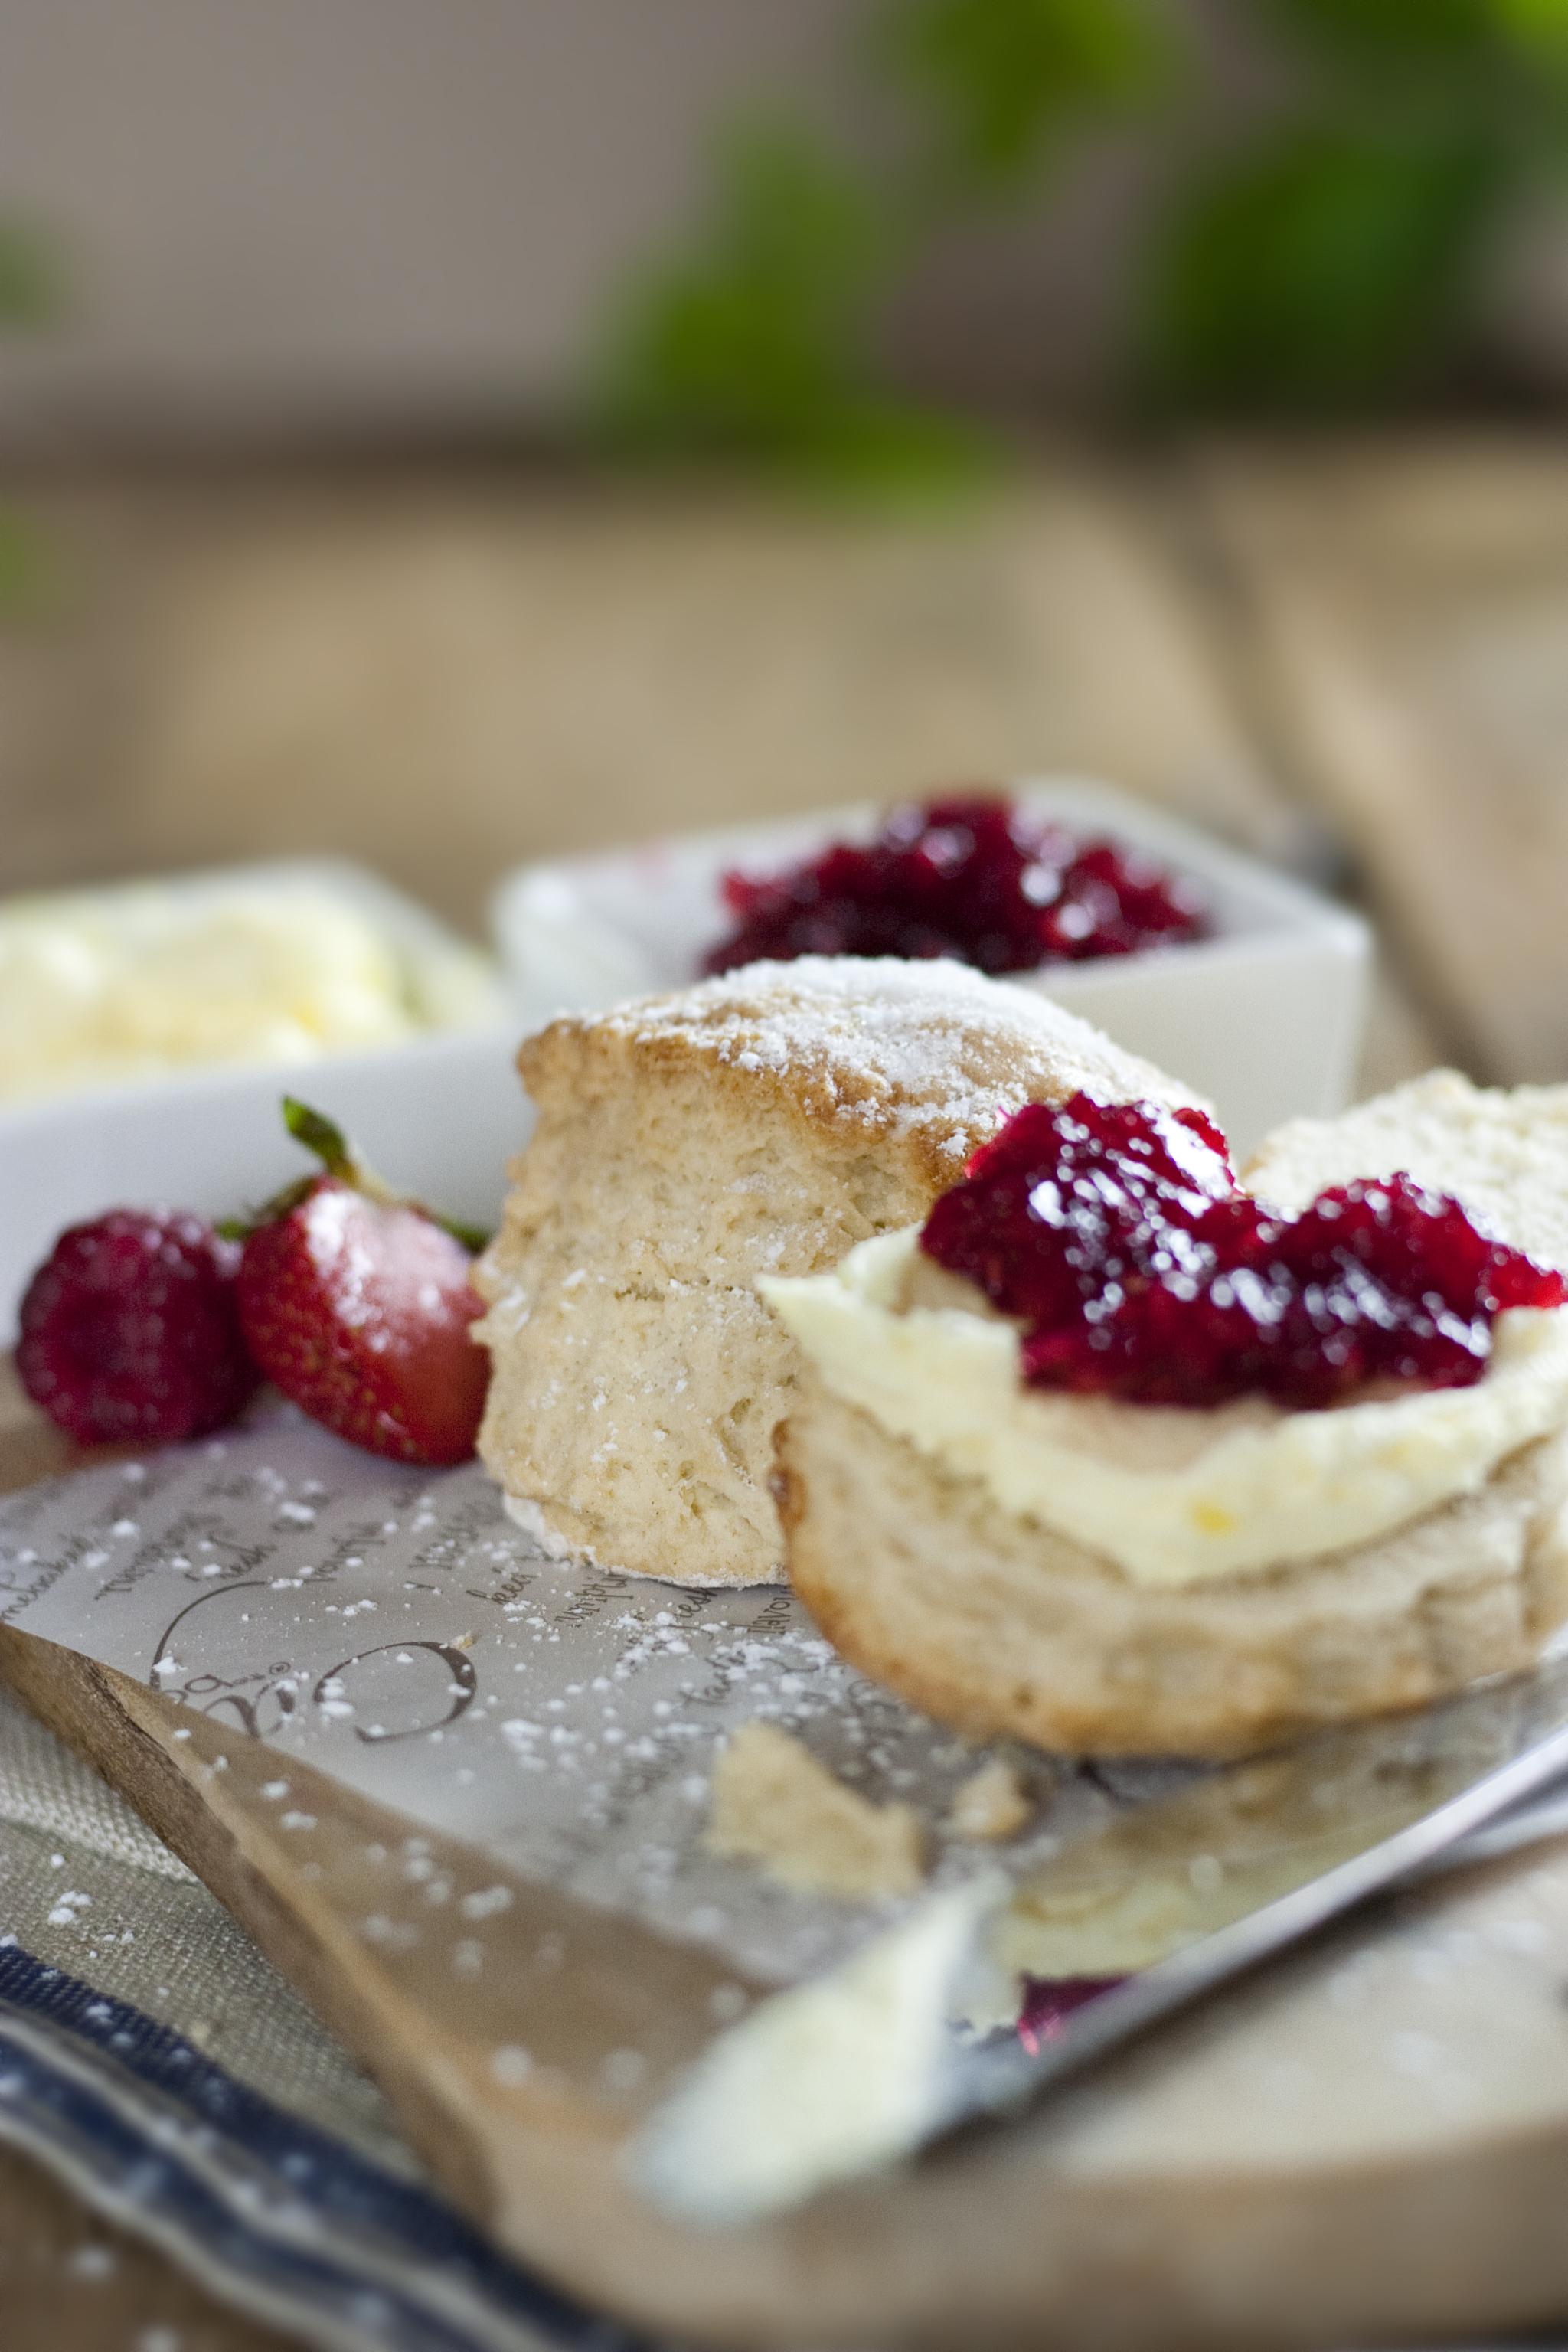 Photo of scones with cream and jam